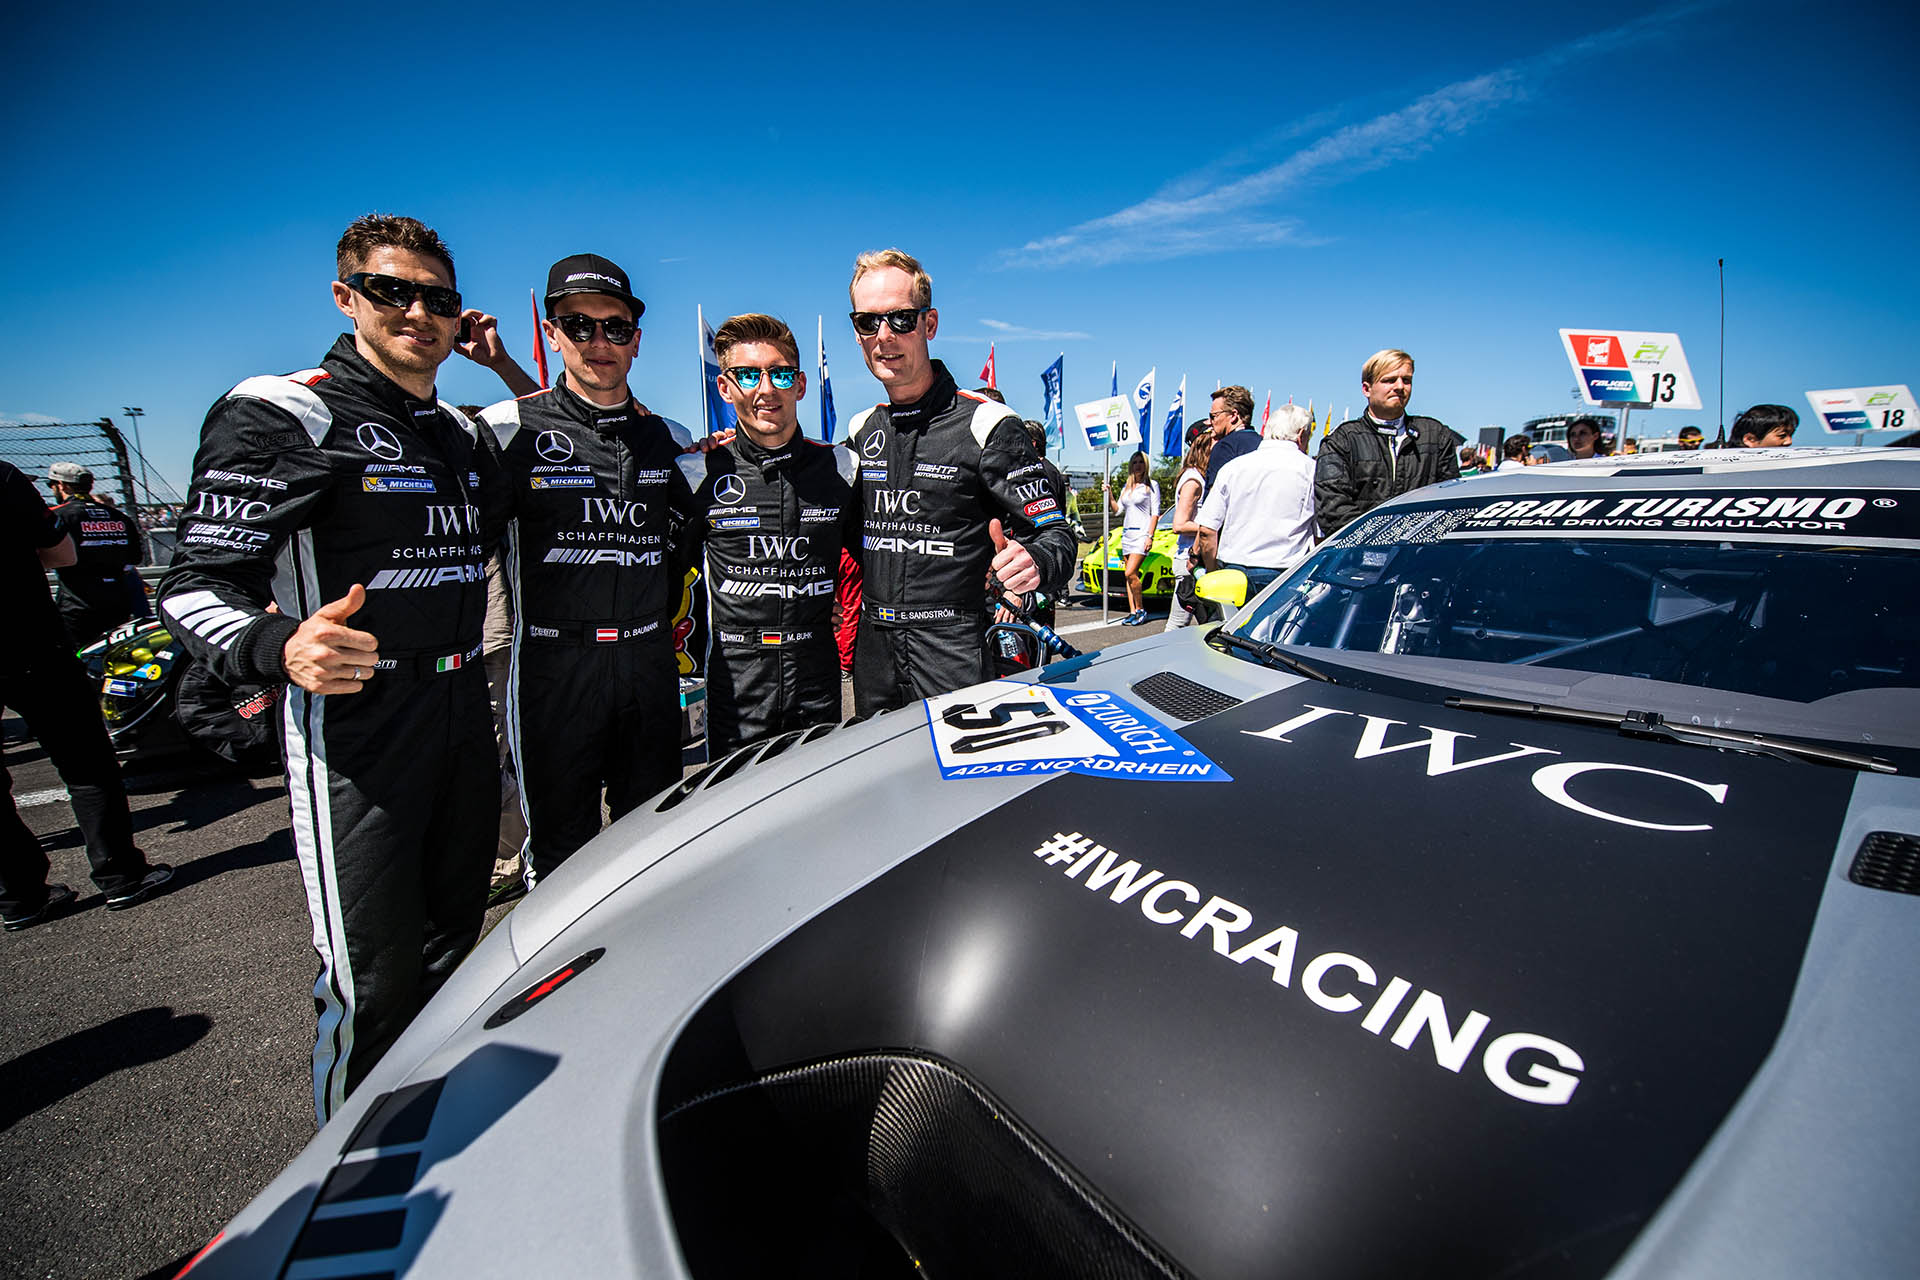 Mercedes-AMG-Team im IWC-Outfit